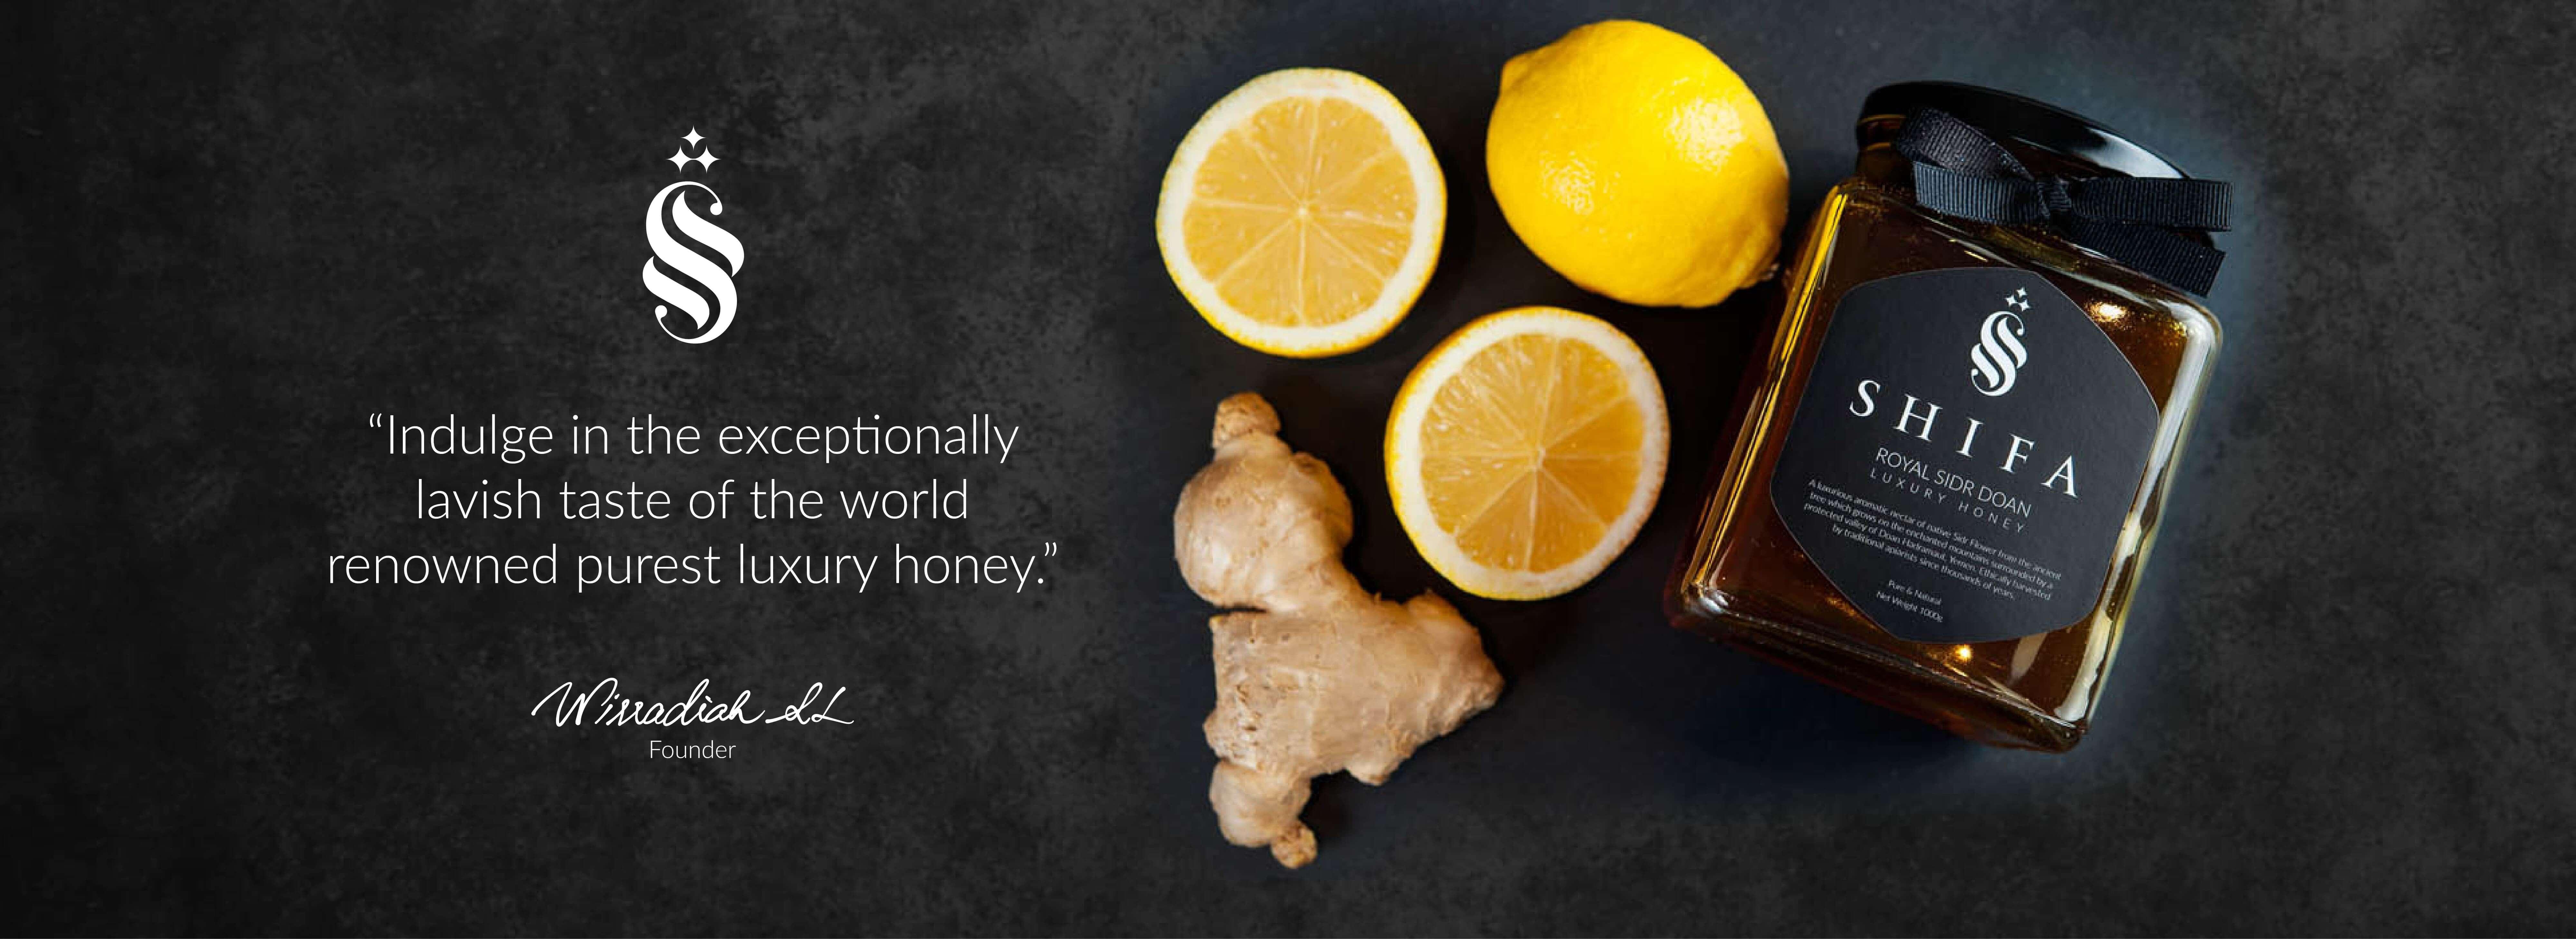 Sid honey banner